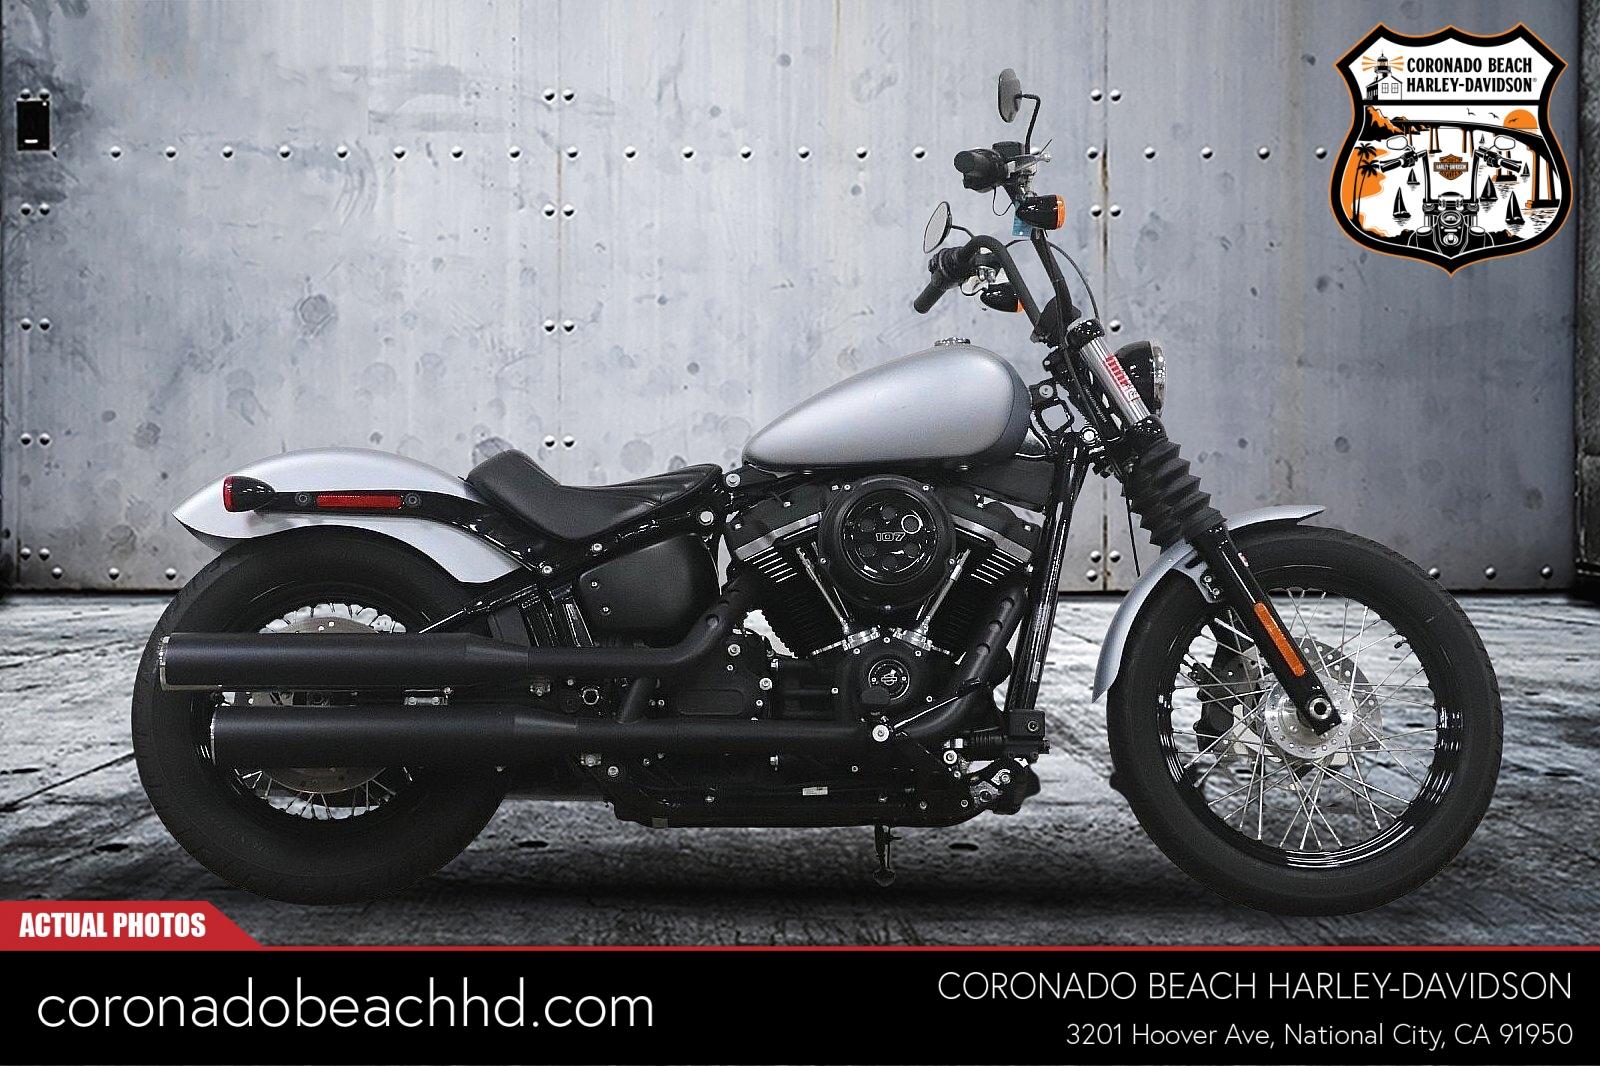 2020 Harley-Davidson Street Bob [83]